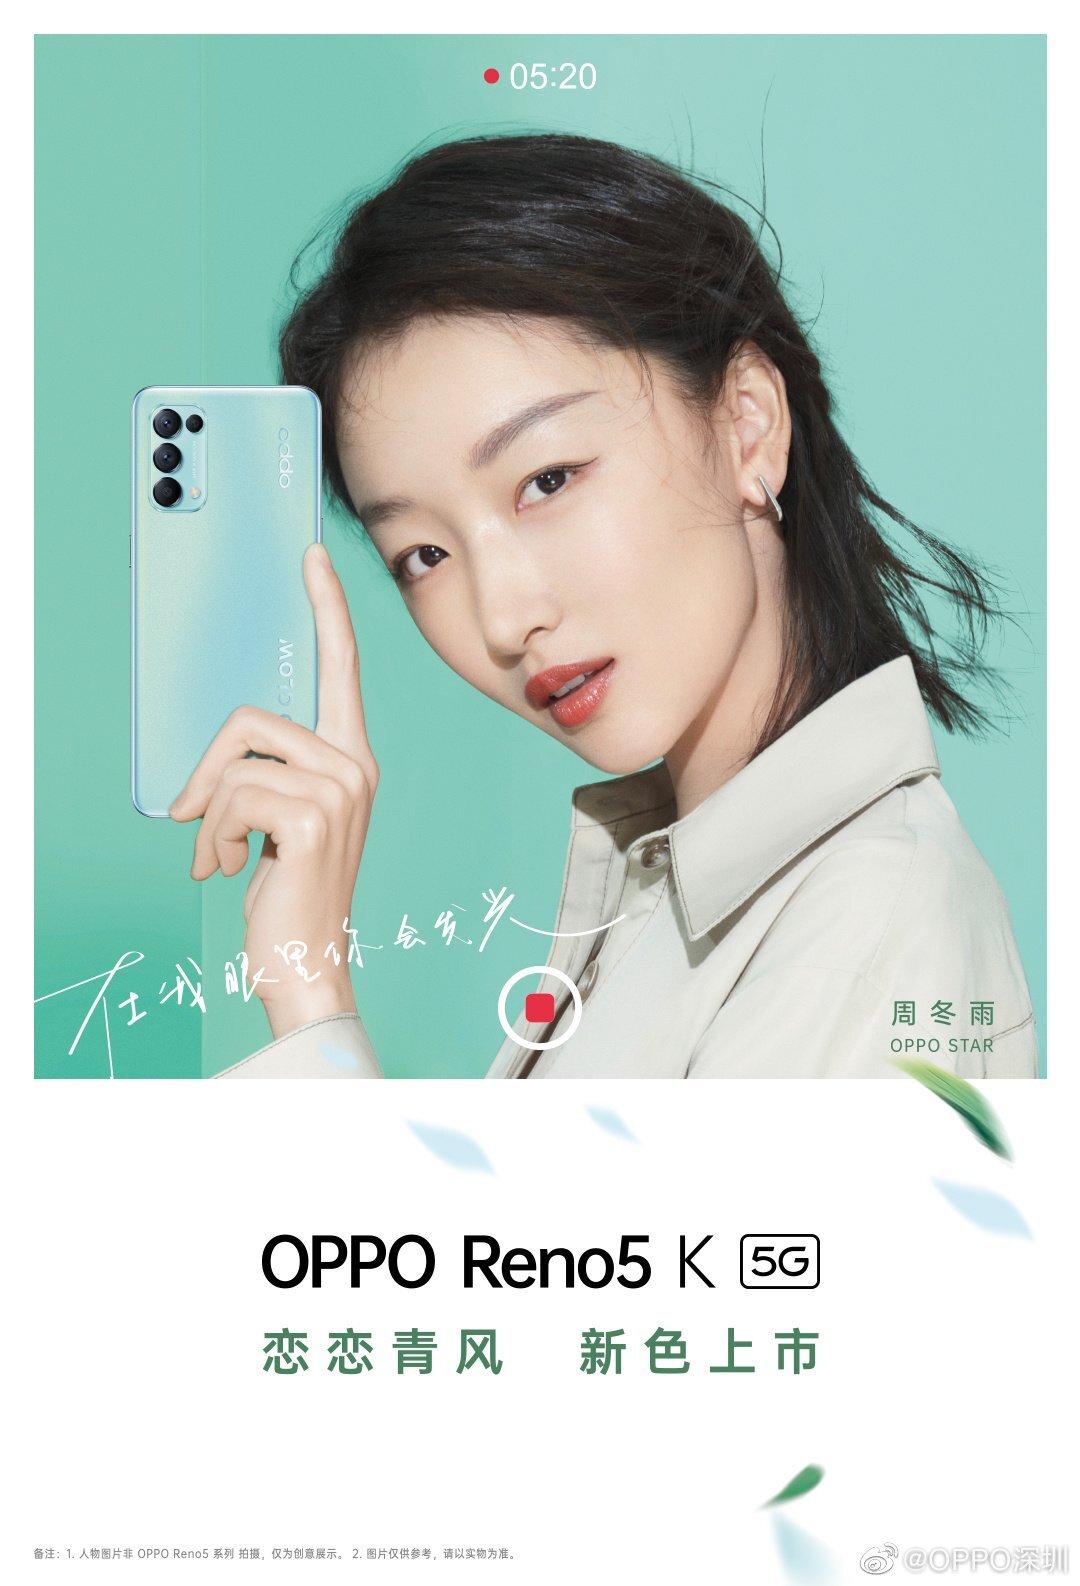 Reno5 K 3 1080x1586x